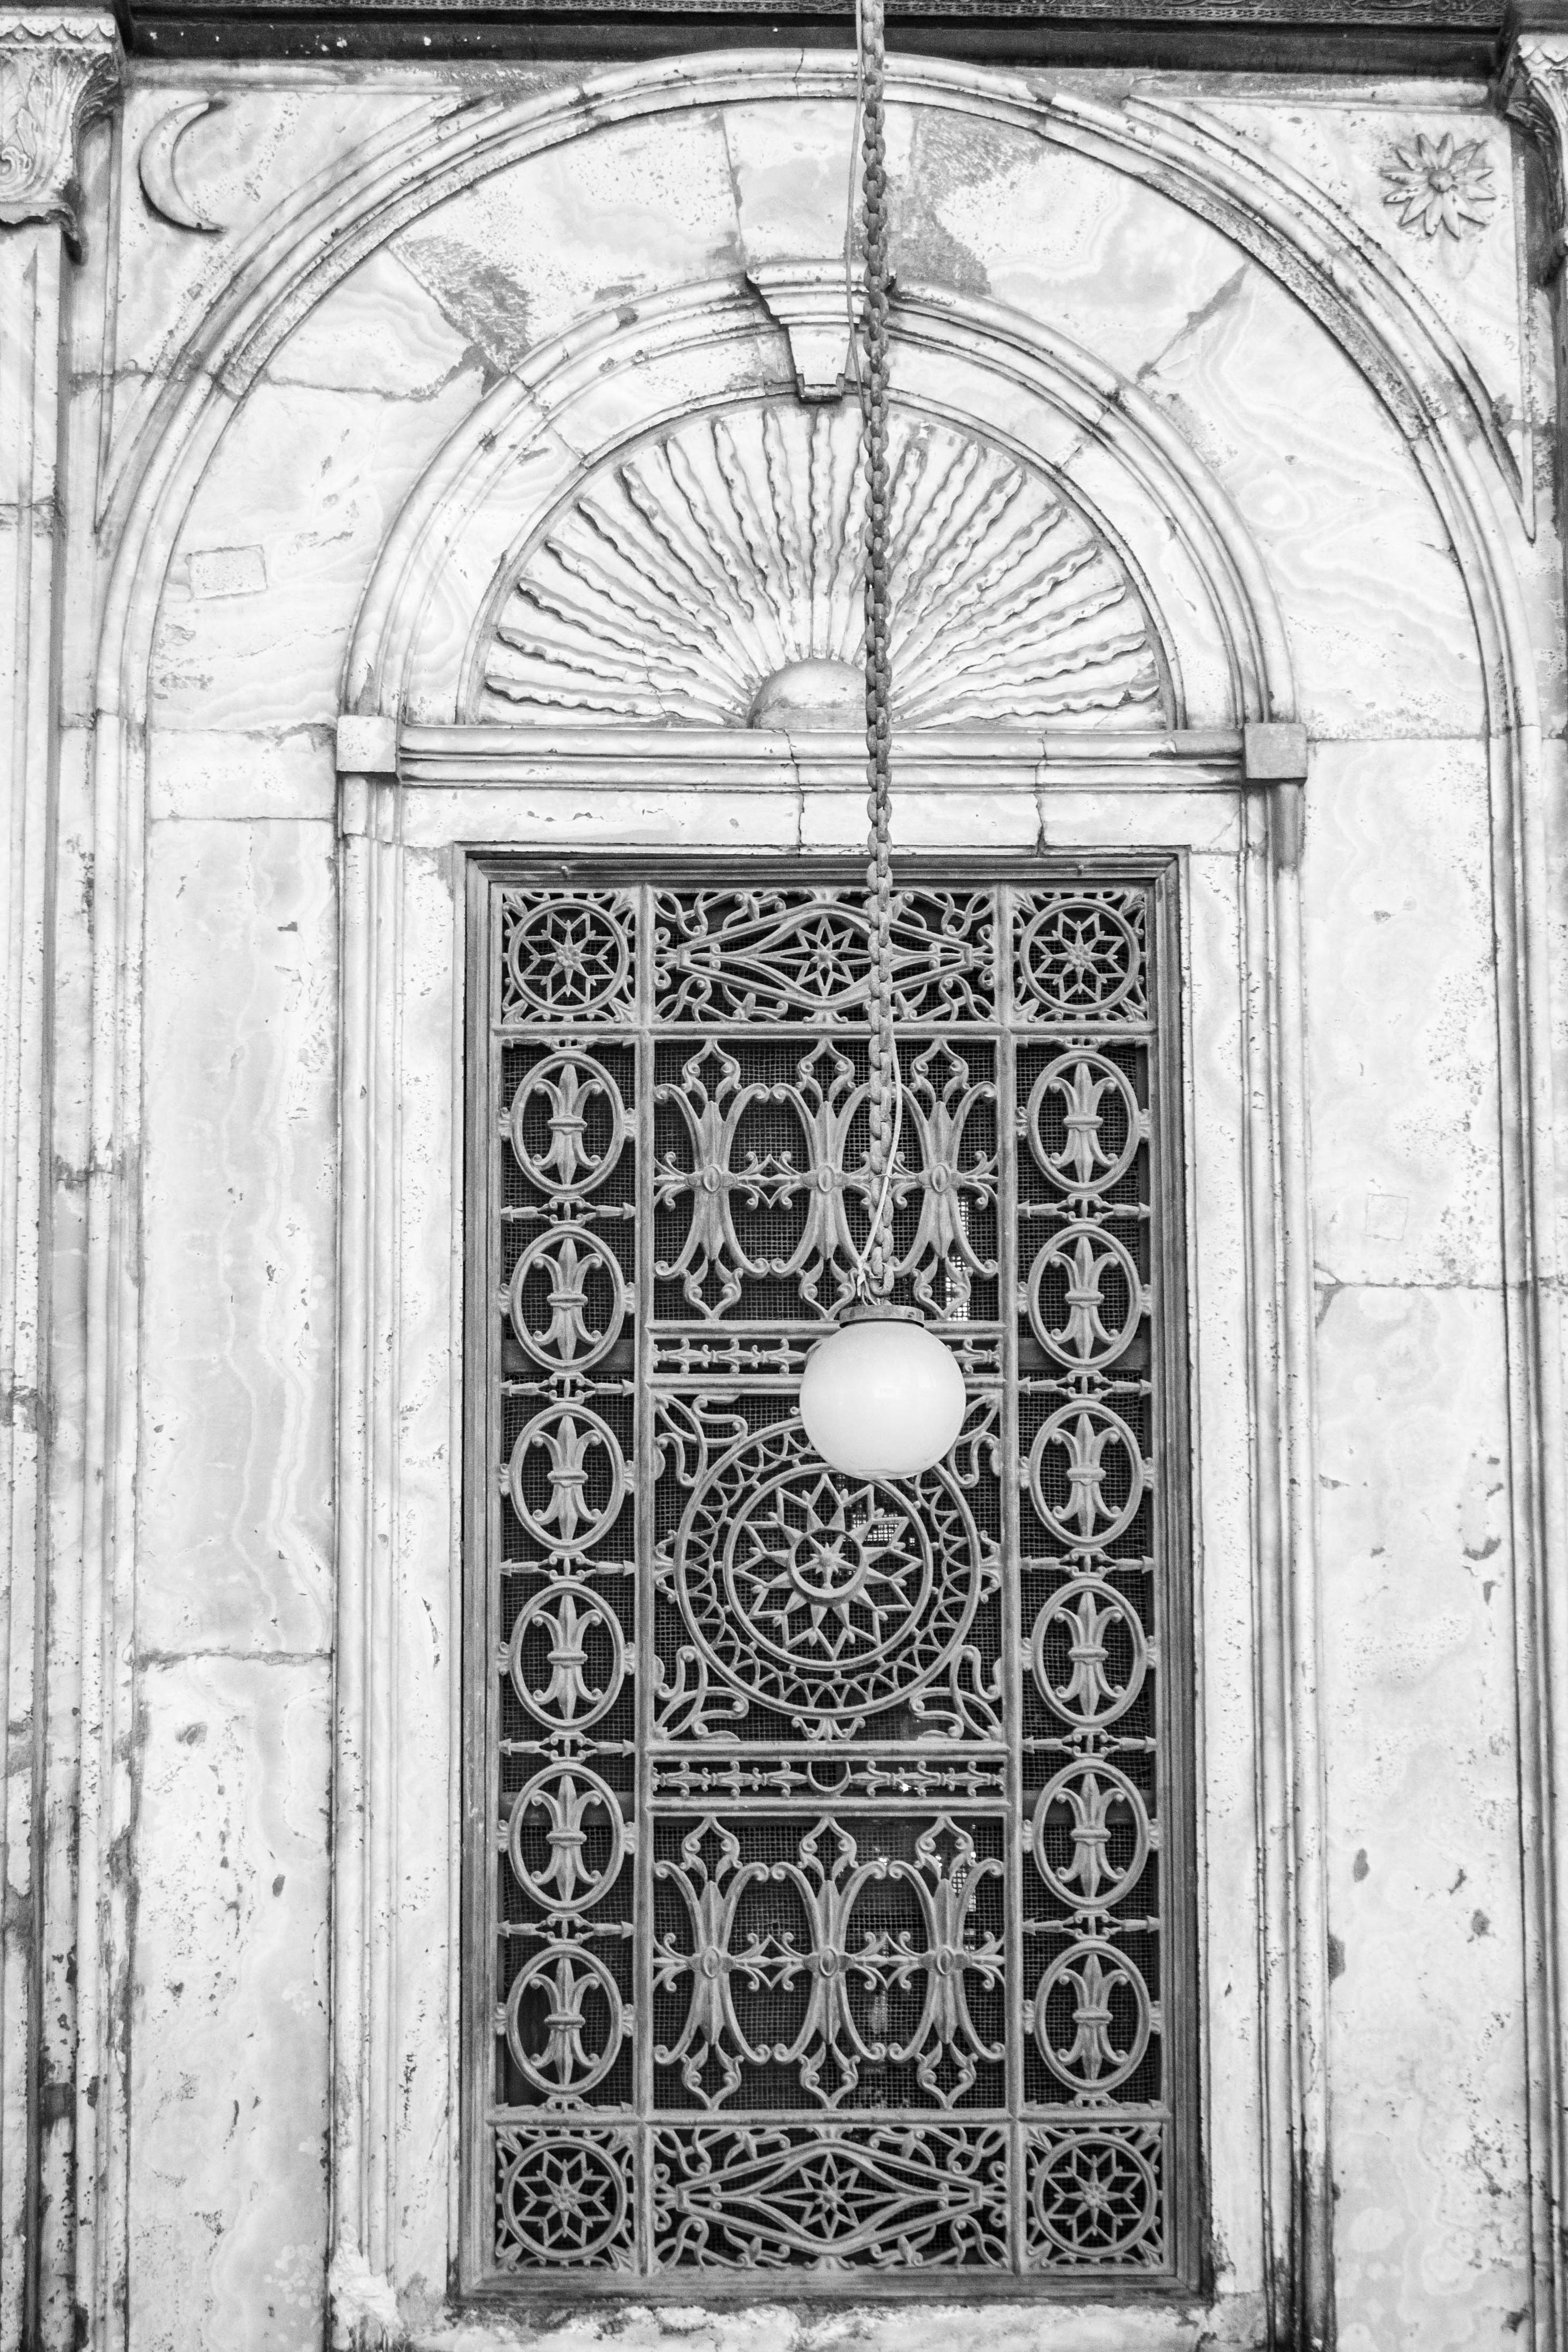 #ancient_egypt #architecture #art_work #Black_N_White!!!! #Door #engineering #Islamist Model #light #photography First Eyeem Photo